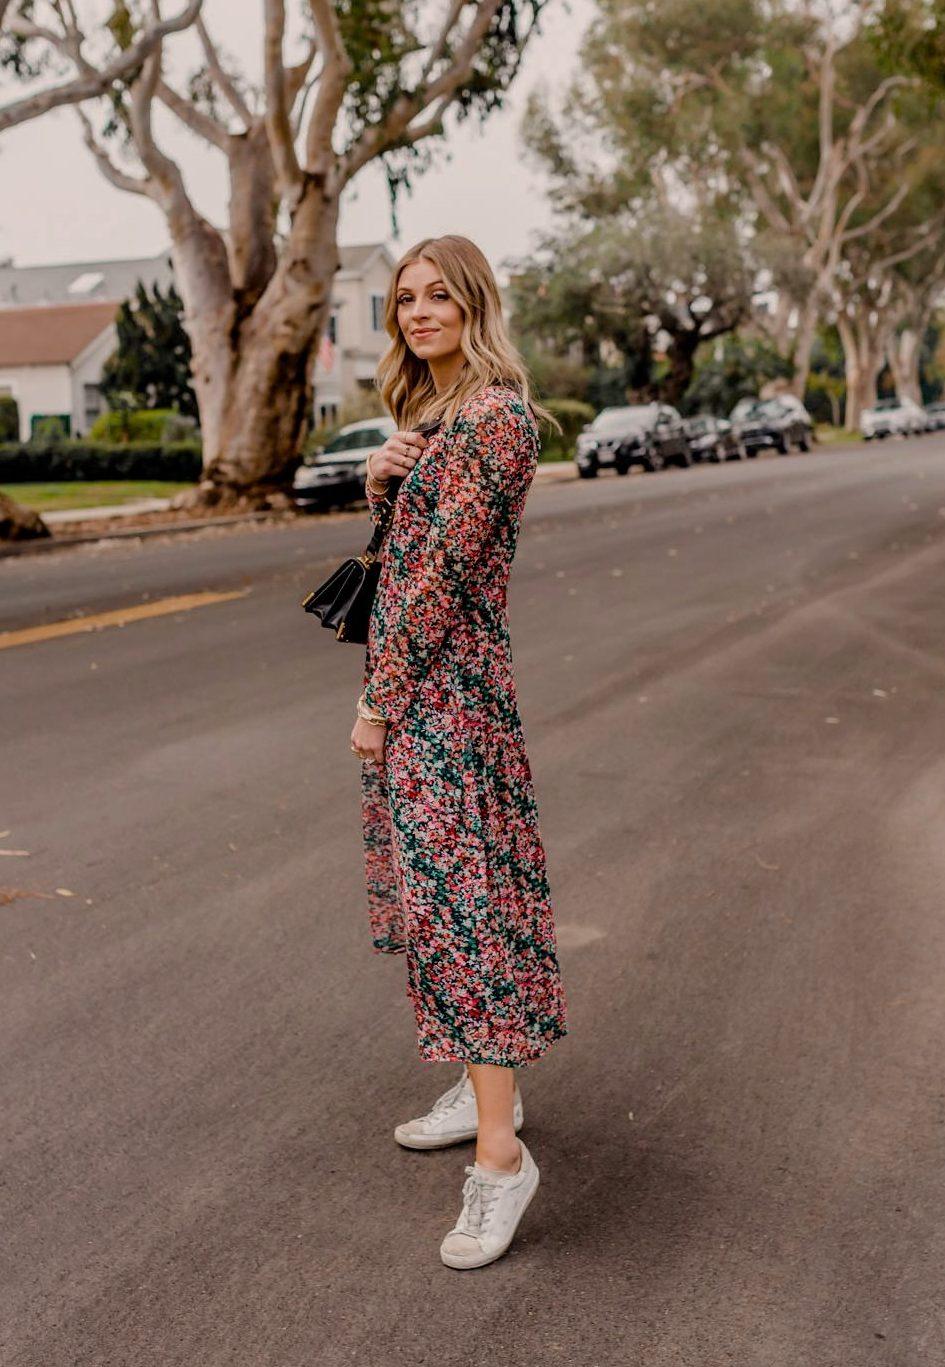 spring dress ideas